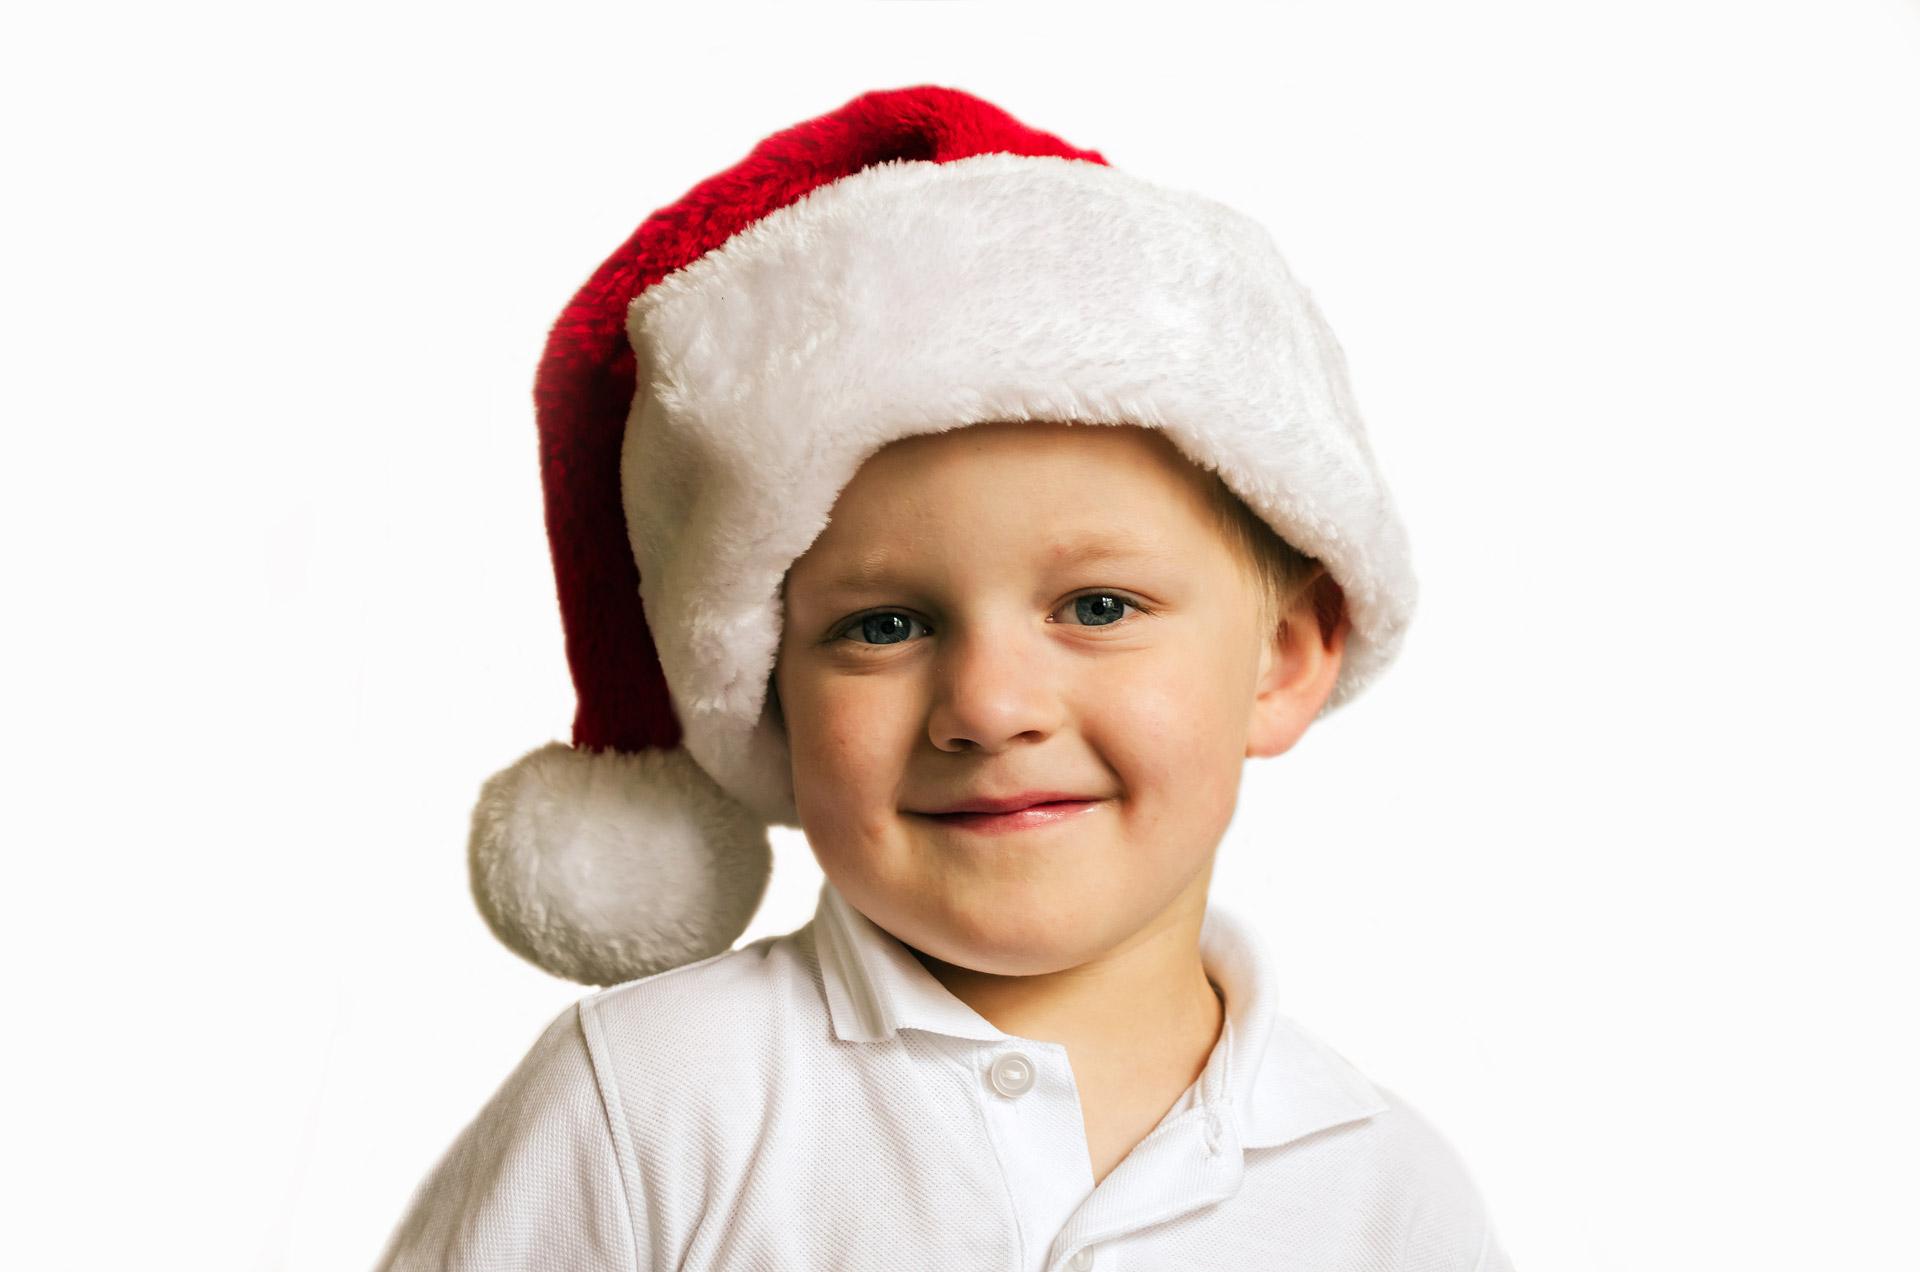 Very Merry Christmas! 海外保育ボランティア先でのクリスマスコンサート